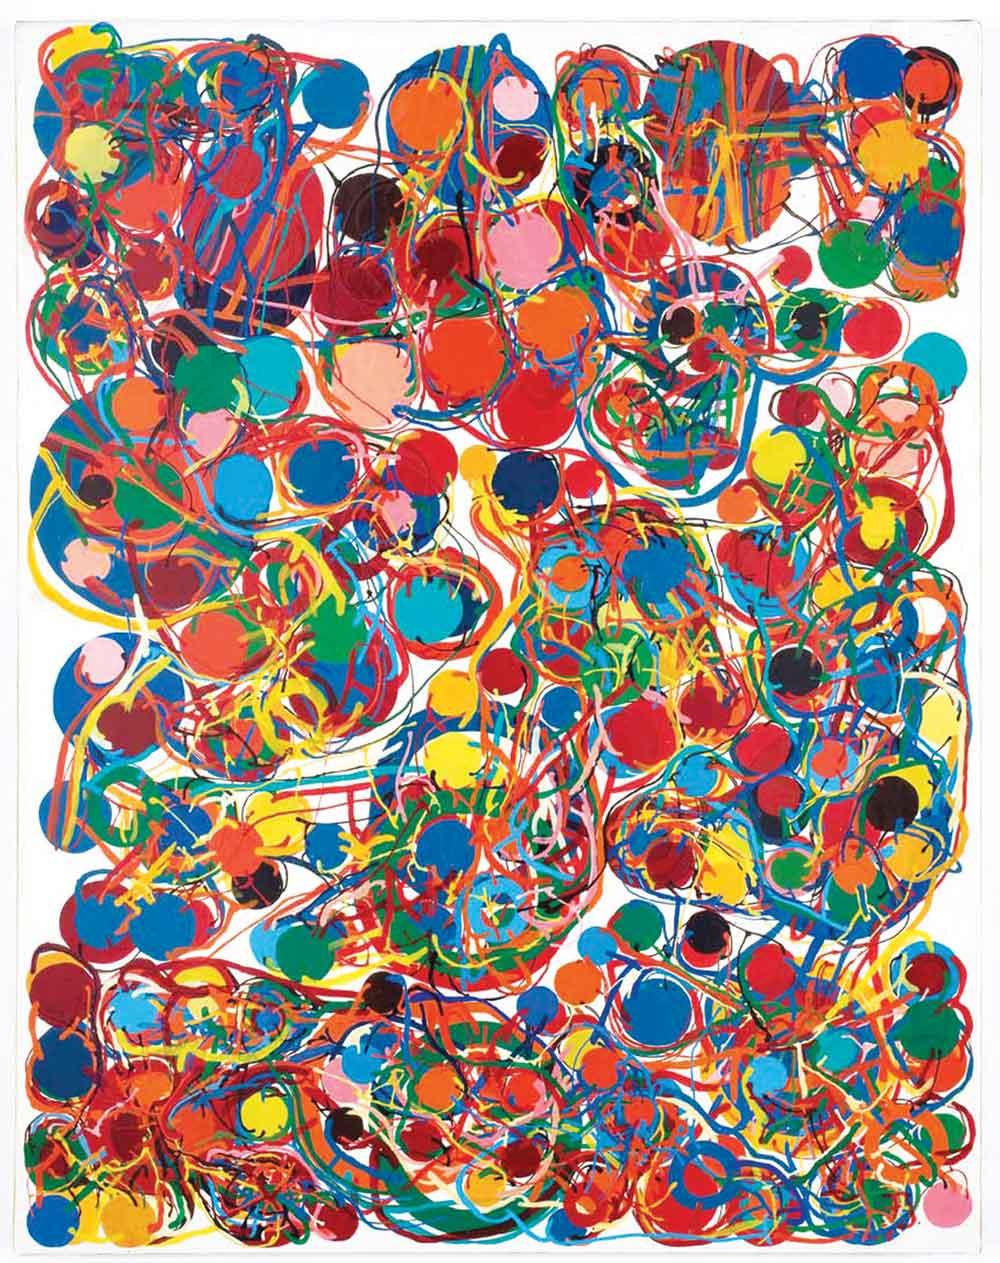 "Atsuko Tanaka, Work, 1969, Vinyl paint on canvas, 45 5/8"" x 35 7/8"". © Ryoji Ito Photo: Antonio Maniscalco. Courtesy Hauser & Wirth."